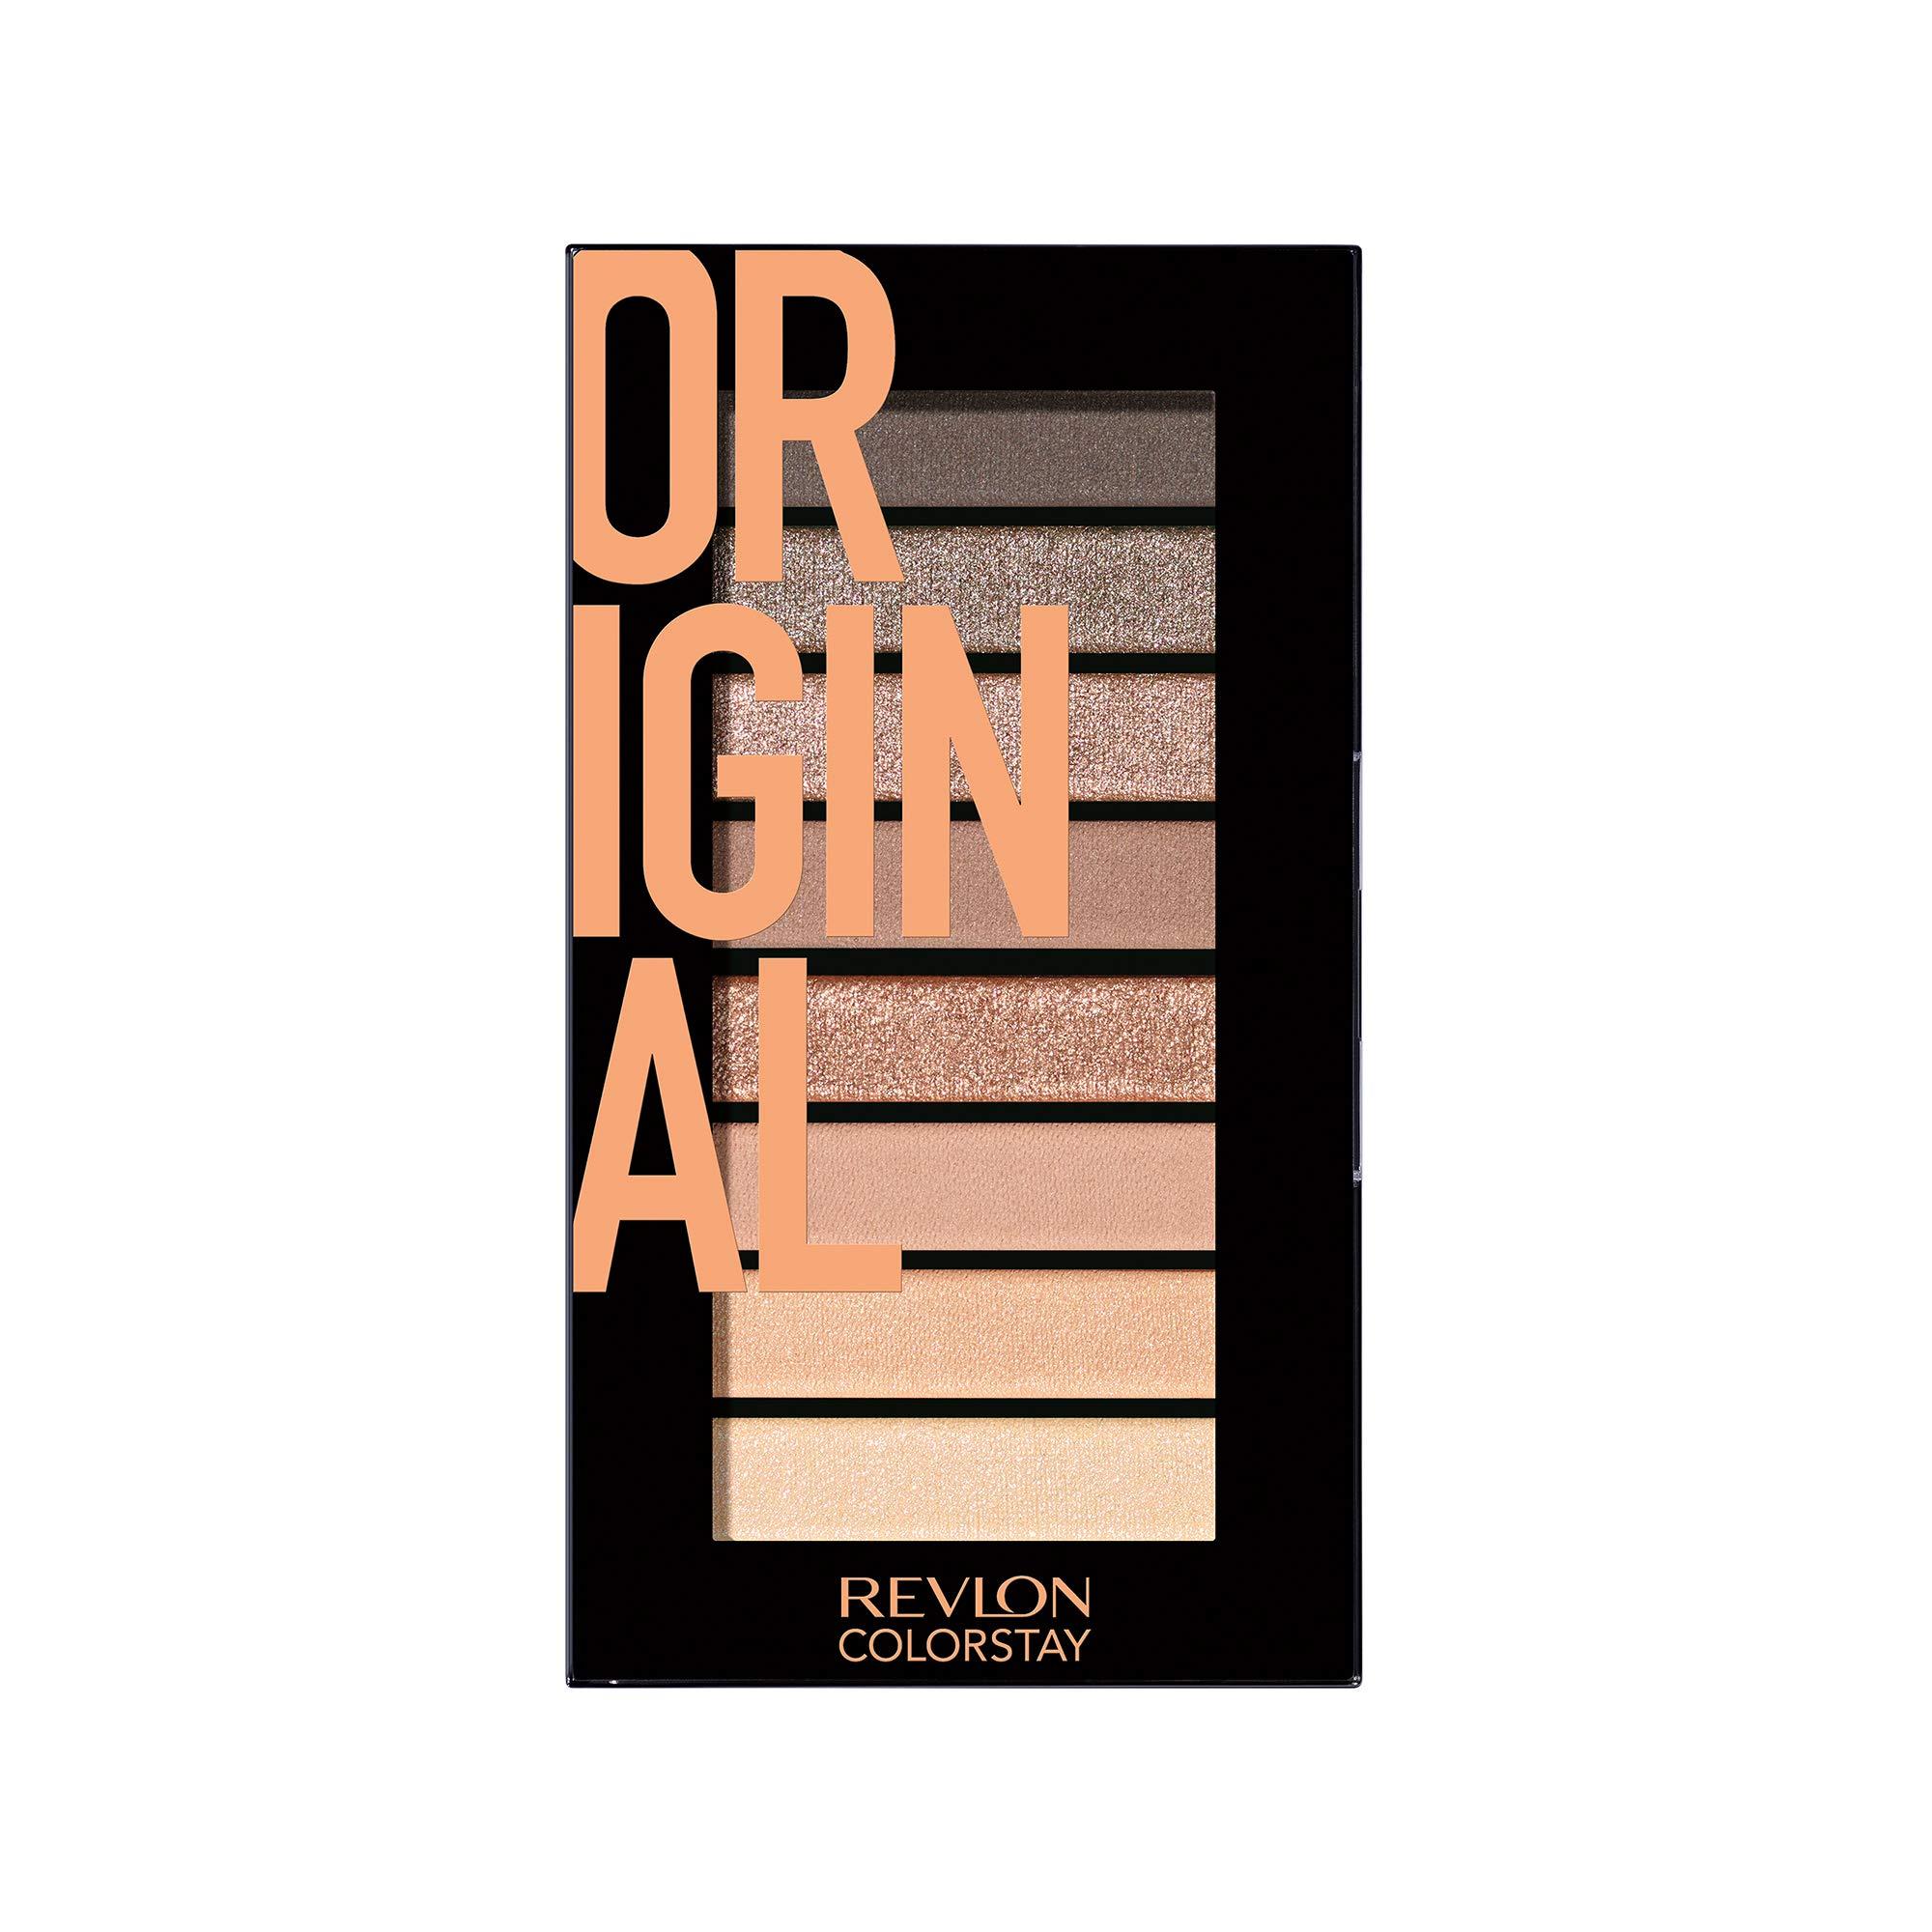 Revlon Colorstay Looks Book Eyeshadow Palette, Original, 3.4 Ounce